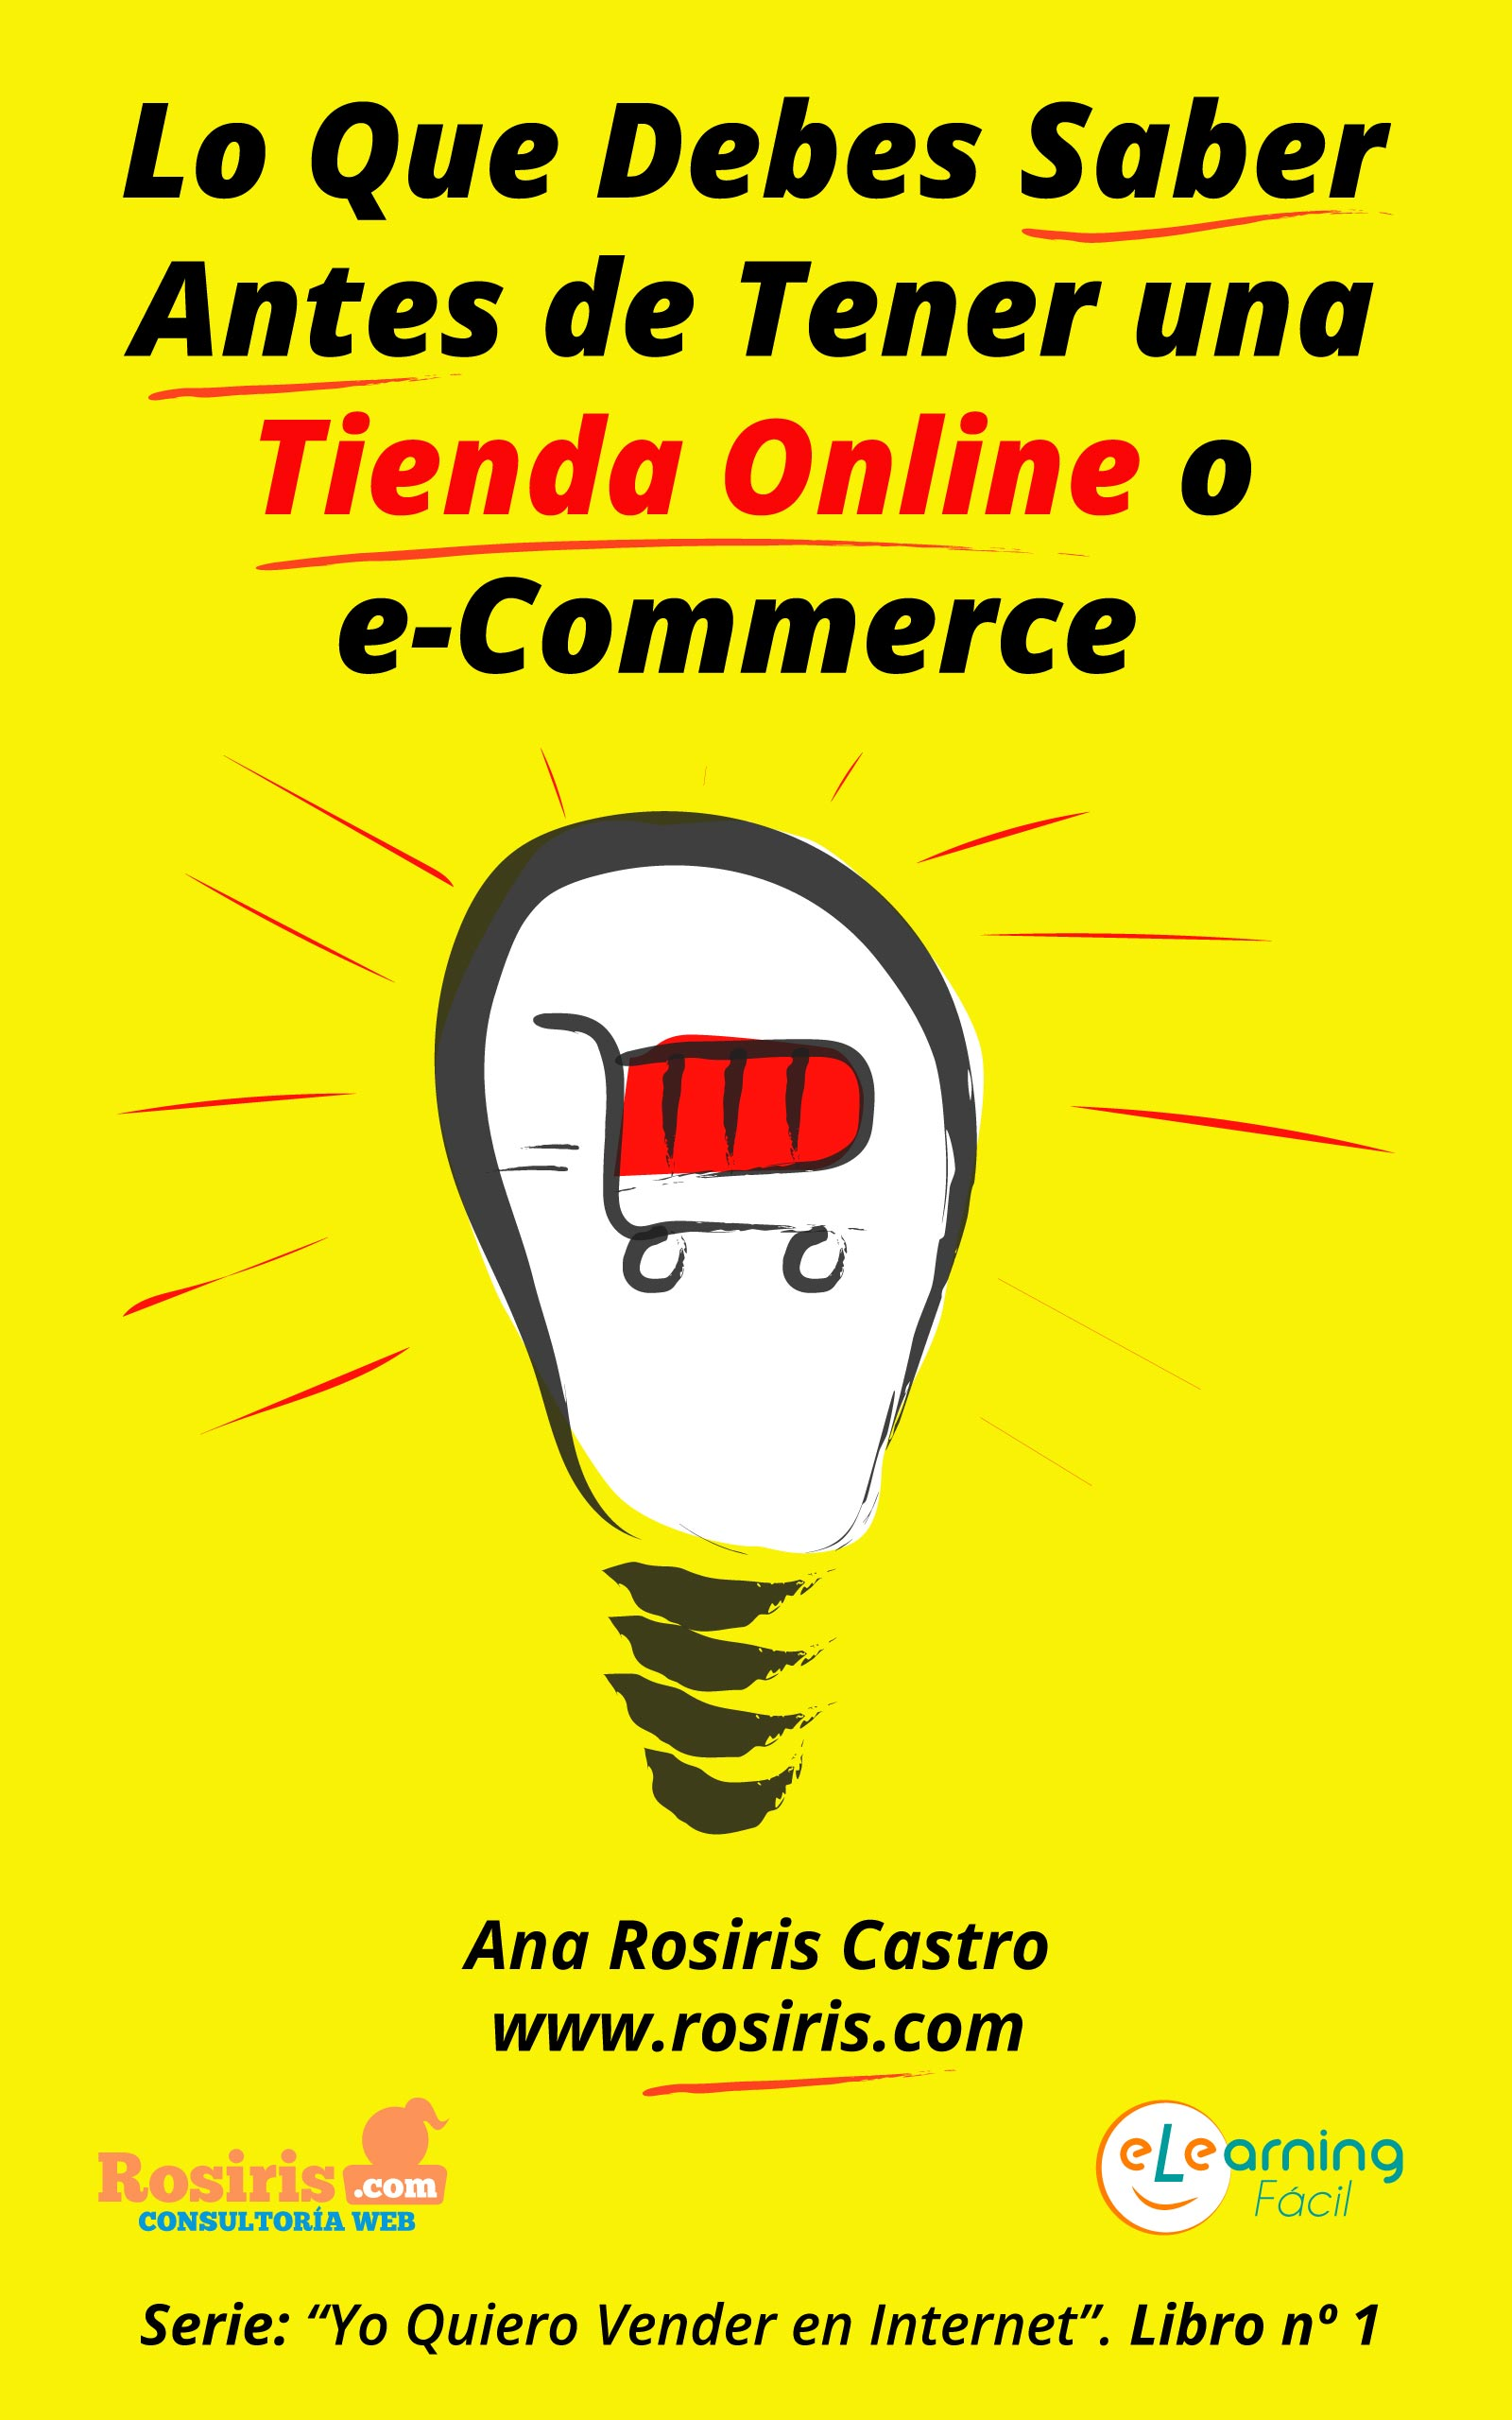 Iniciación al e-commerce - comercio electrónico